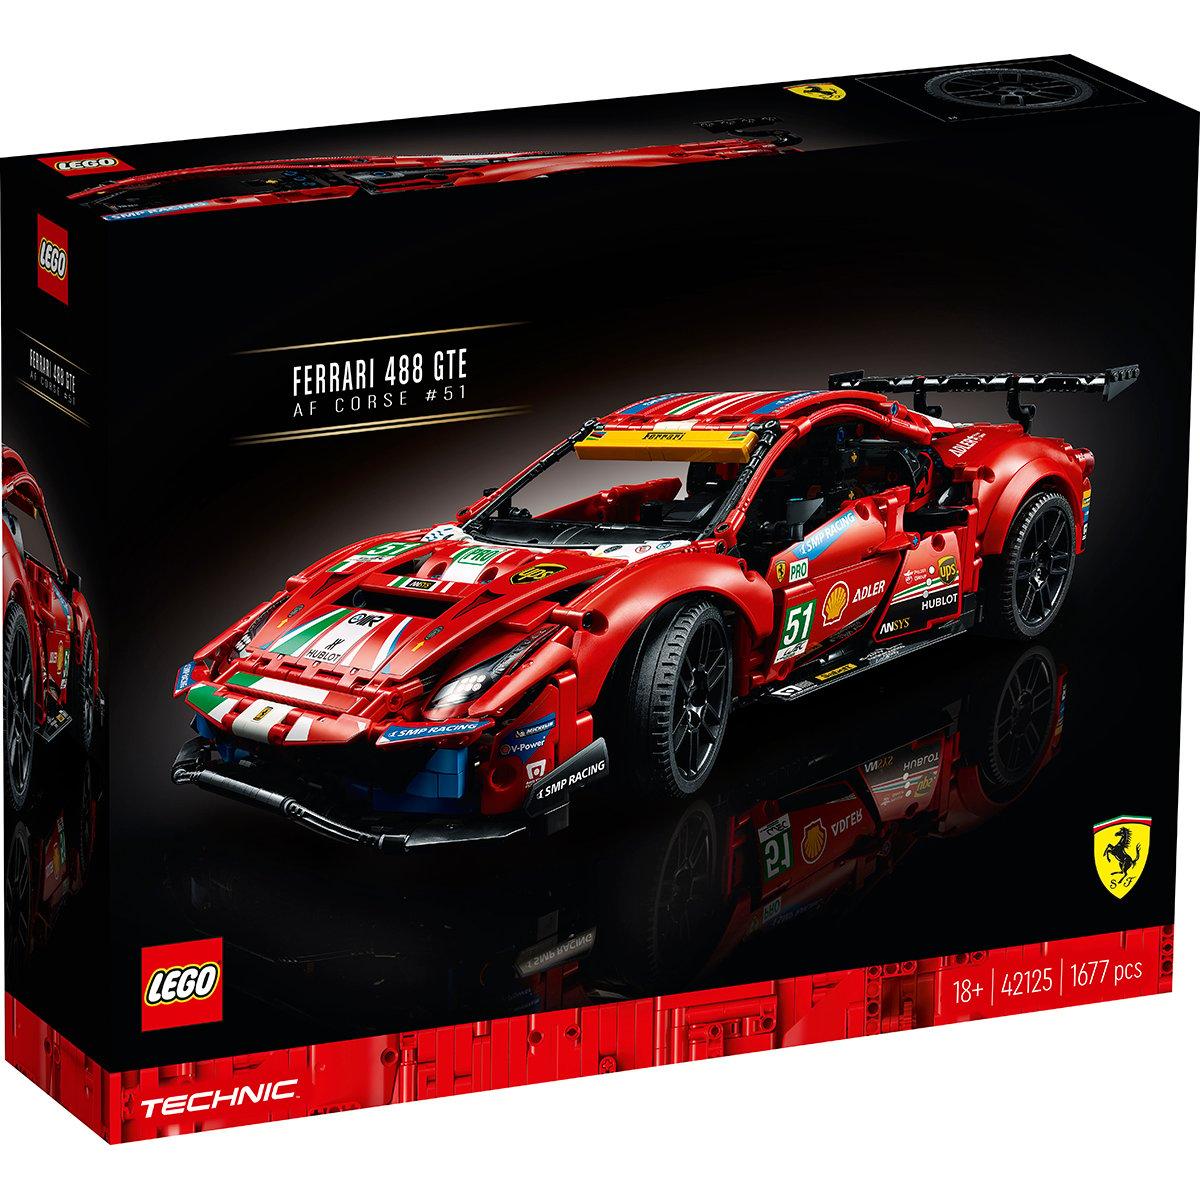 LEGO® Technic - Ferrari 488 GTE AF Corse 51 (42125)